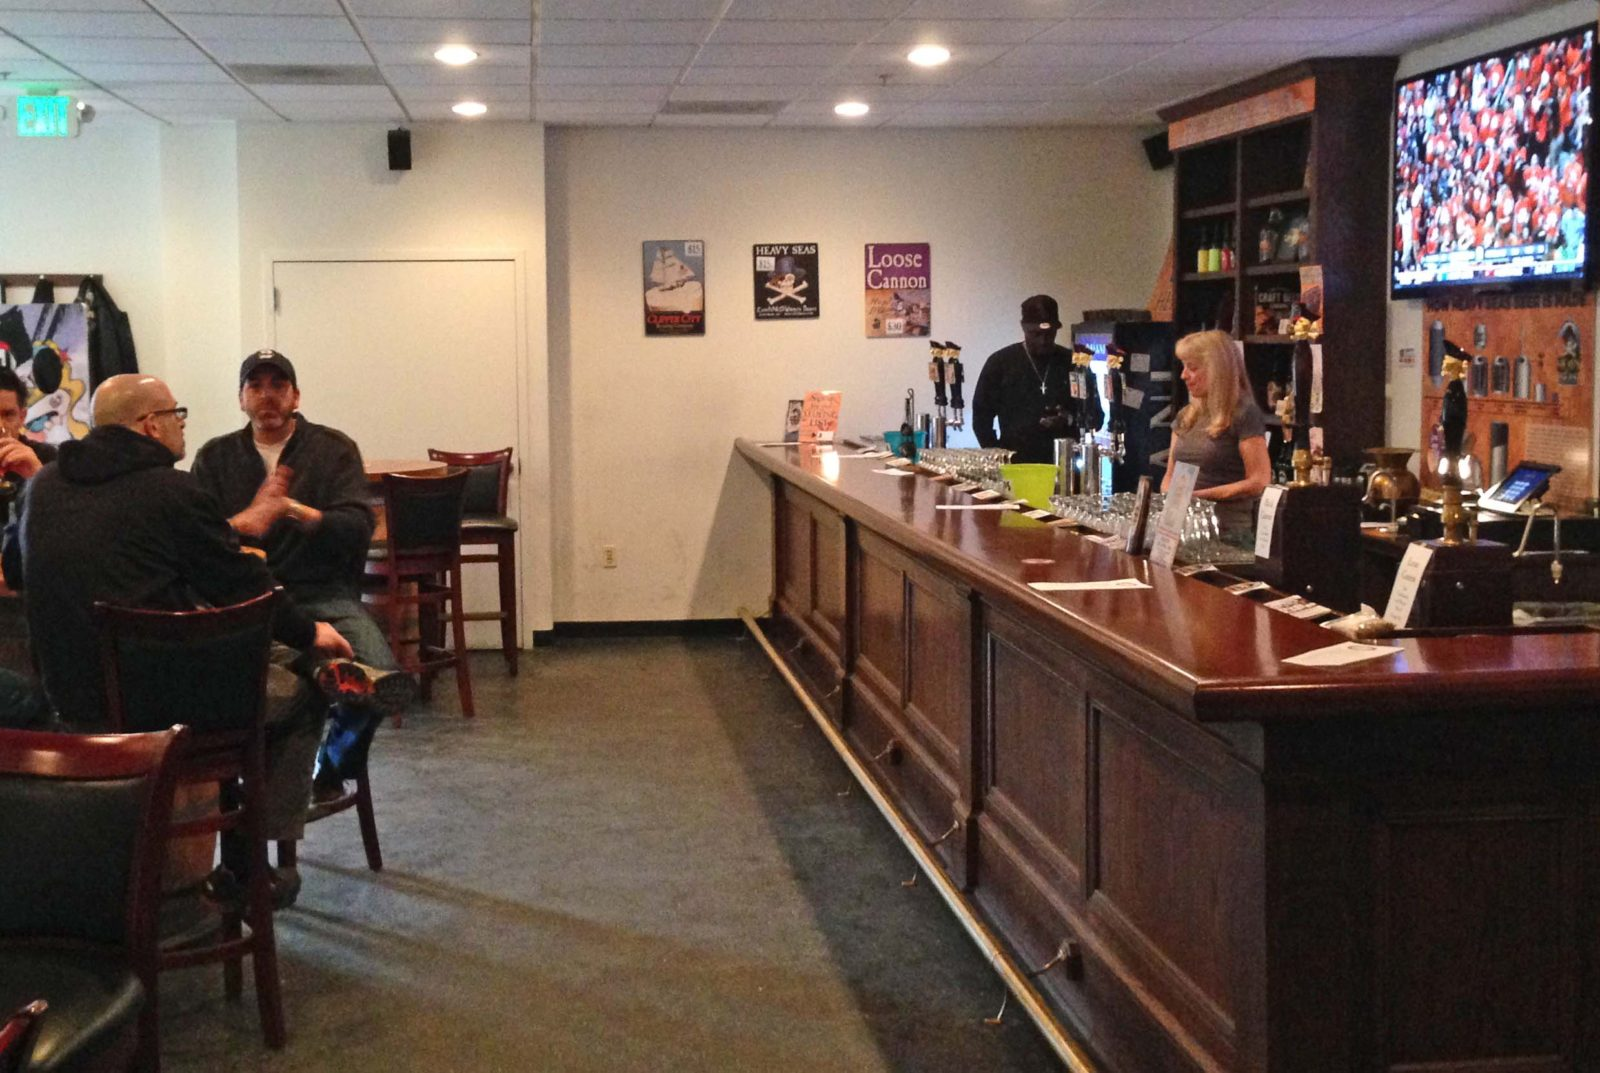 195. Heavy Seas/Clipper City Brewery, Halethorpe MD 2014